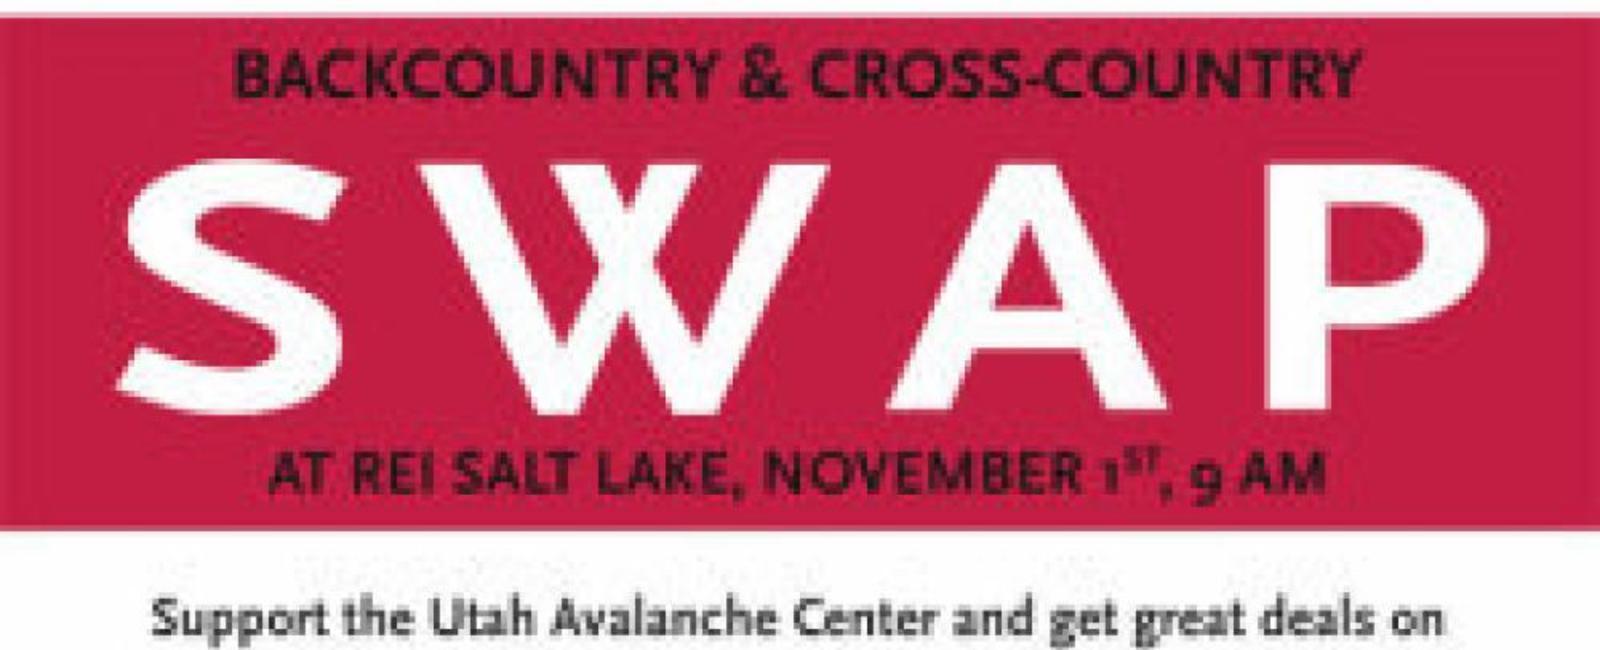 Utah Avalanche Center Gear Swap